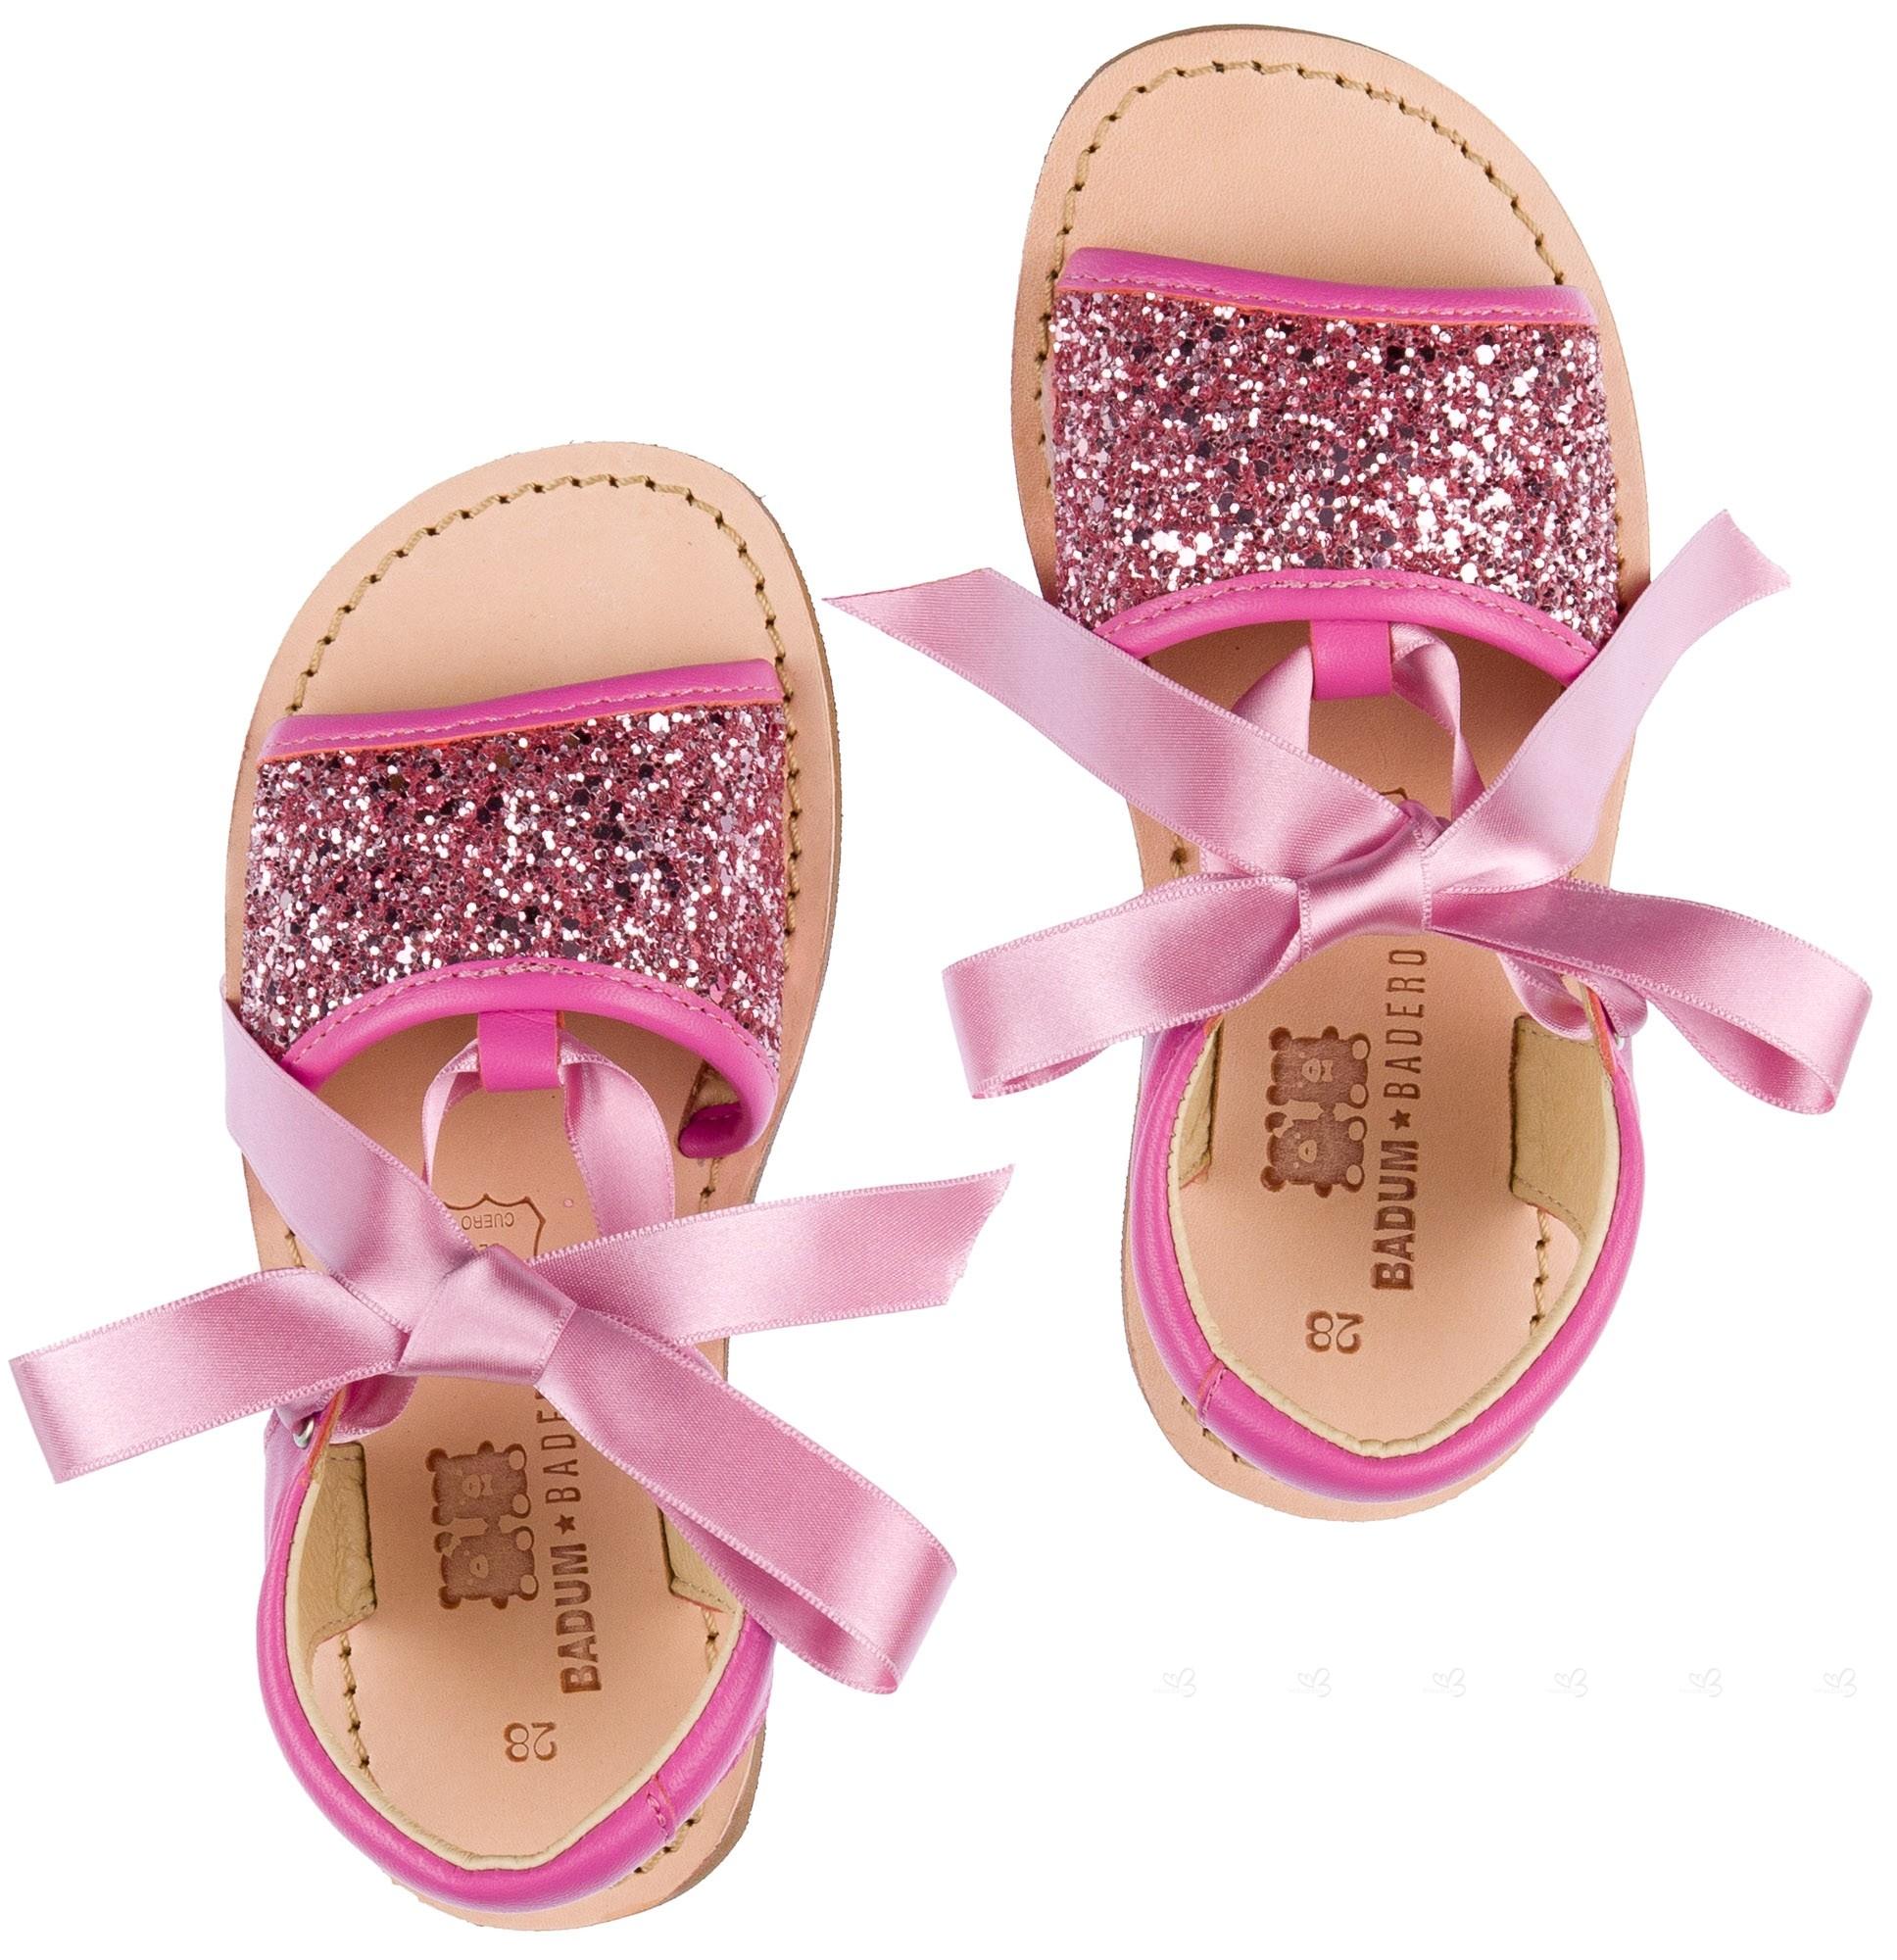 Niña Cinta Raso Con Sandalias Glitter Pielamp; Rosa nw0POk